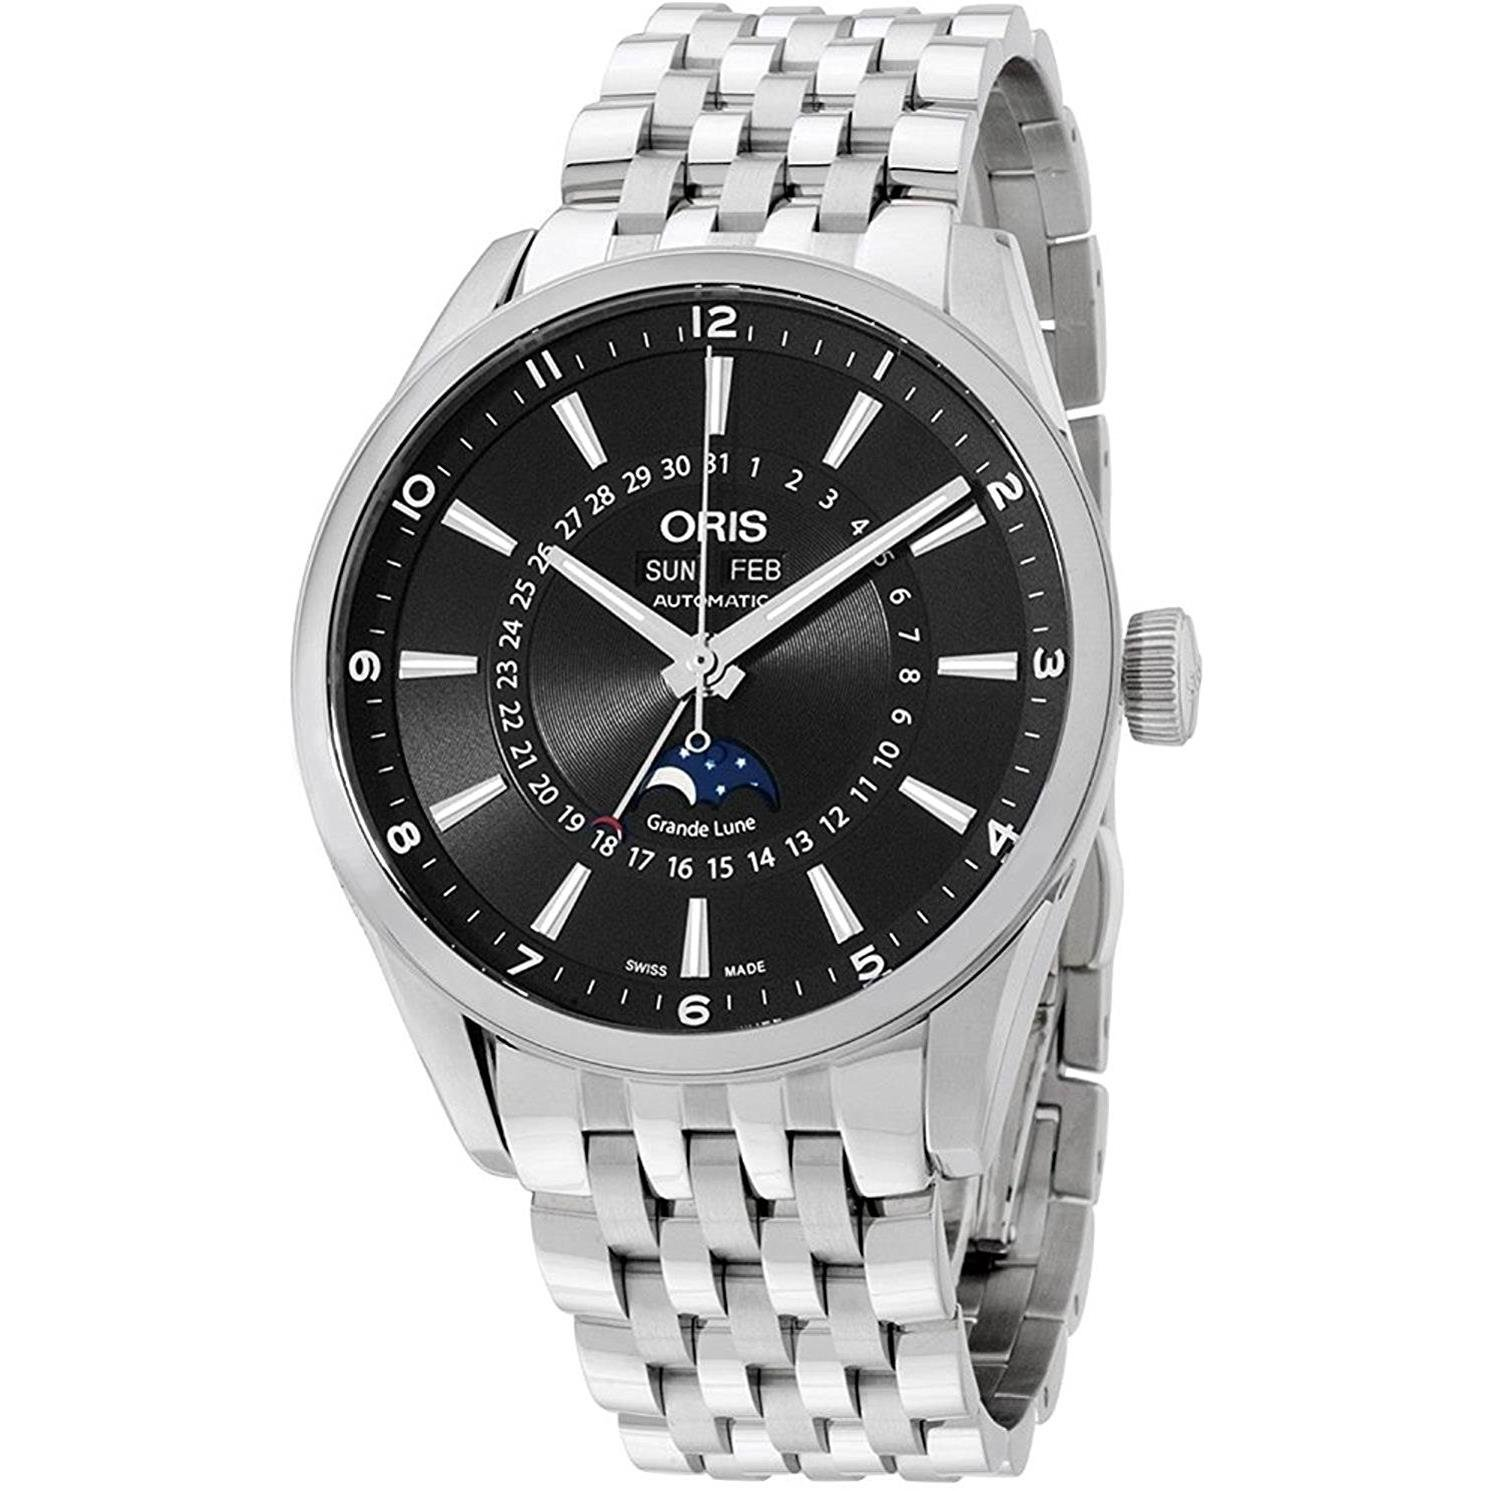 ORIS-Herren-Armbanduhr-42MM-Schweizer-AUTOMATIK-ANALOG-91576434034MB